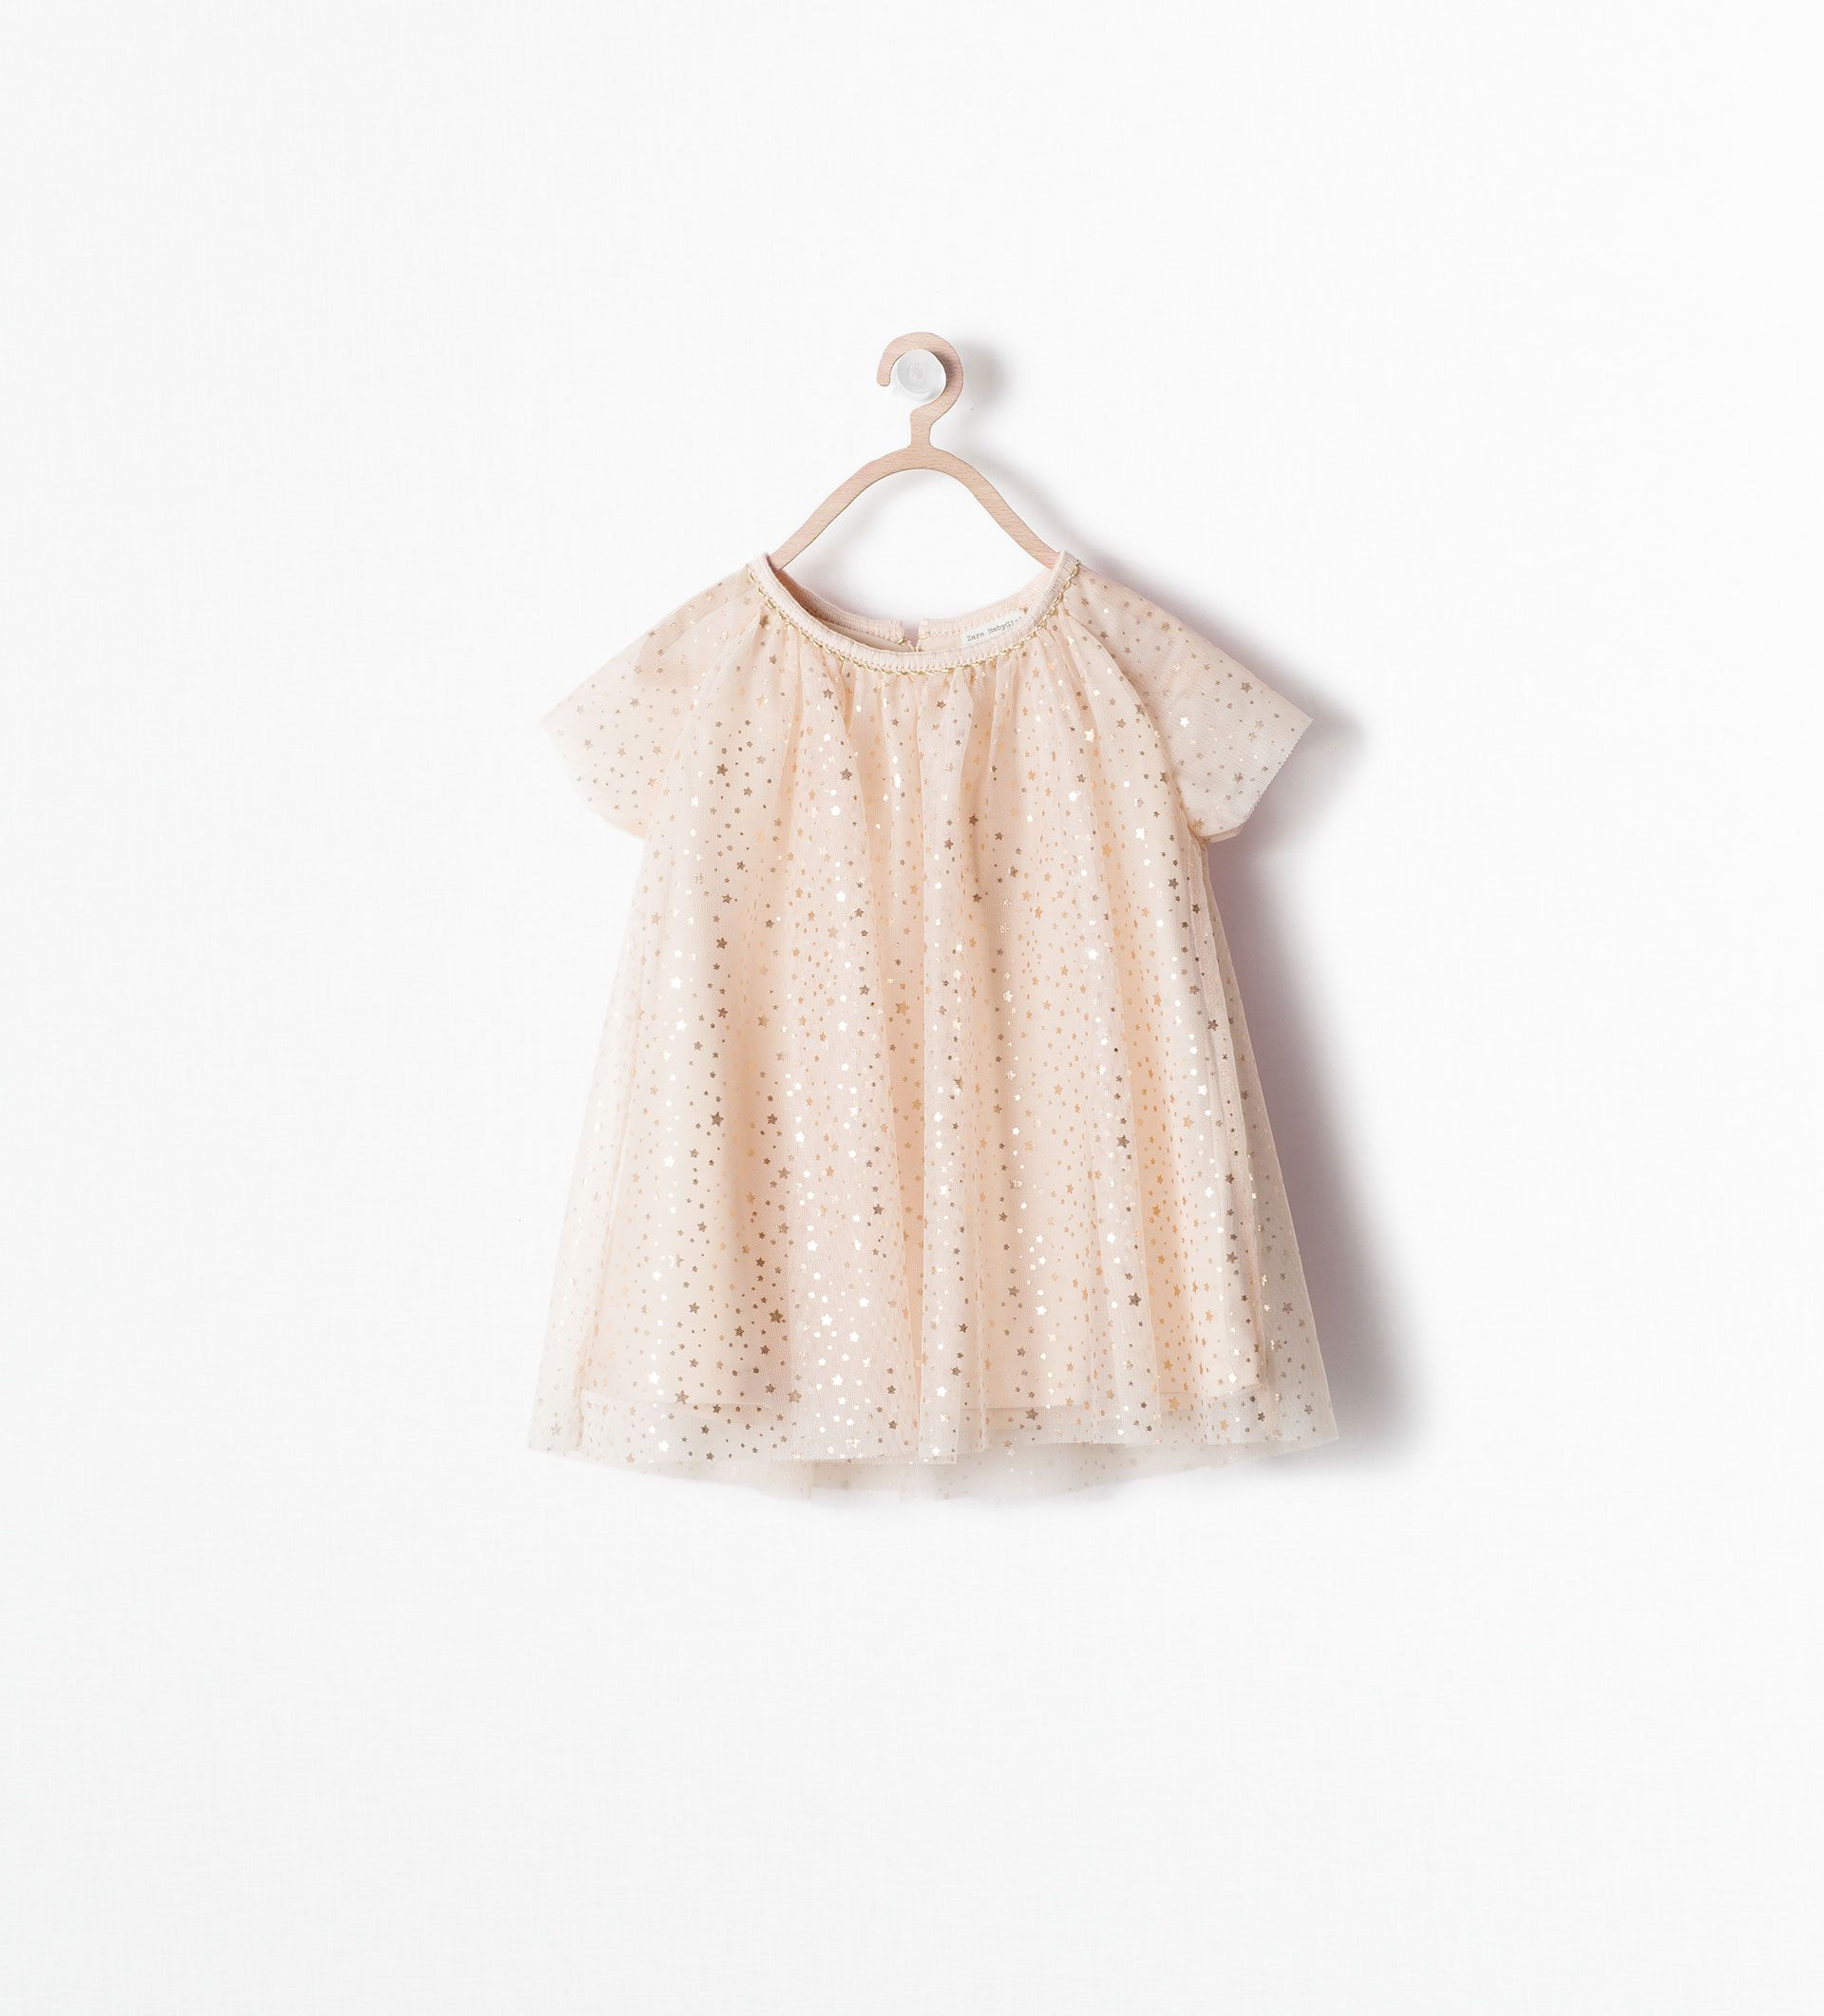 Shiny Dress From Zara Zara Girls Dresses Baby Girl Dresses Shiny Dresses